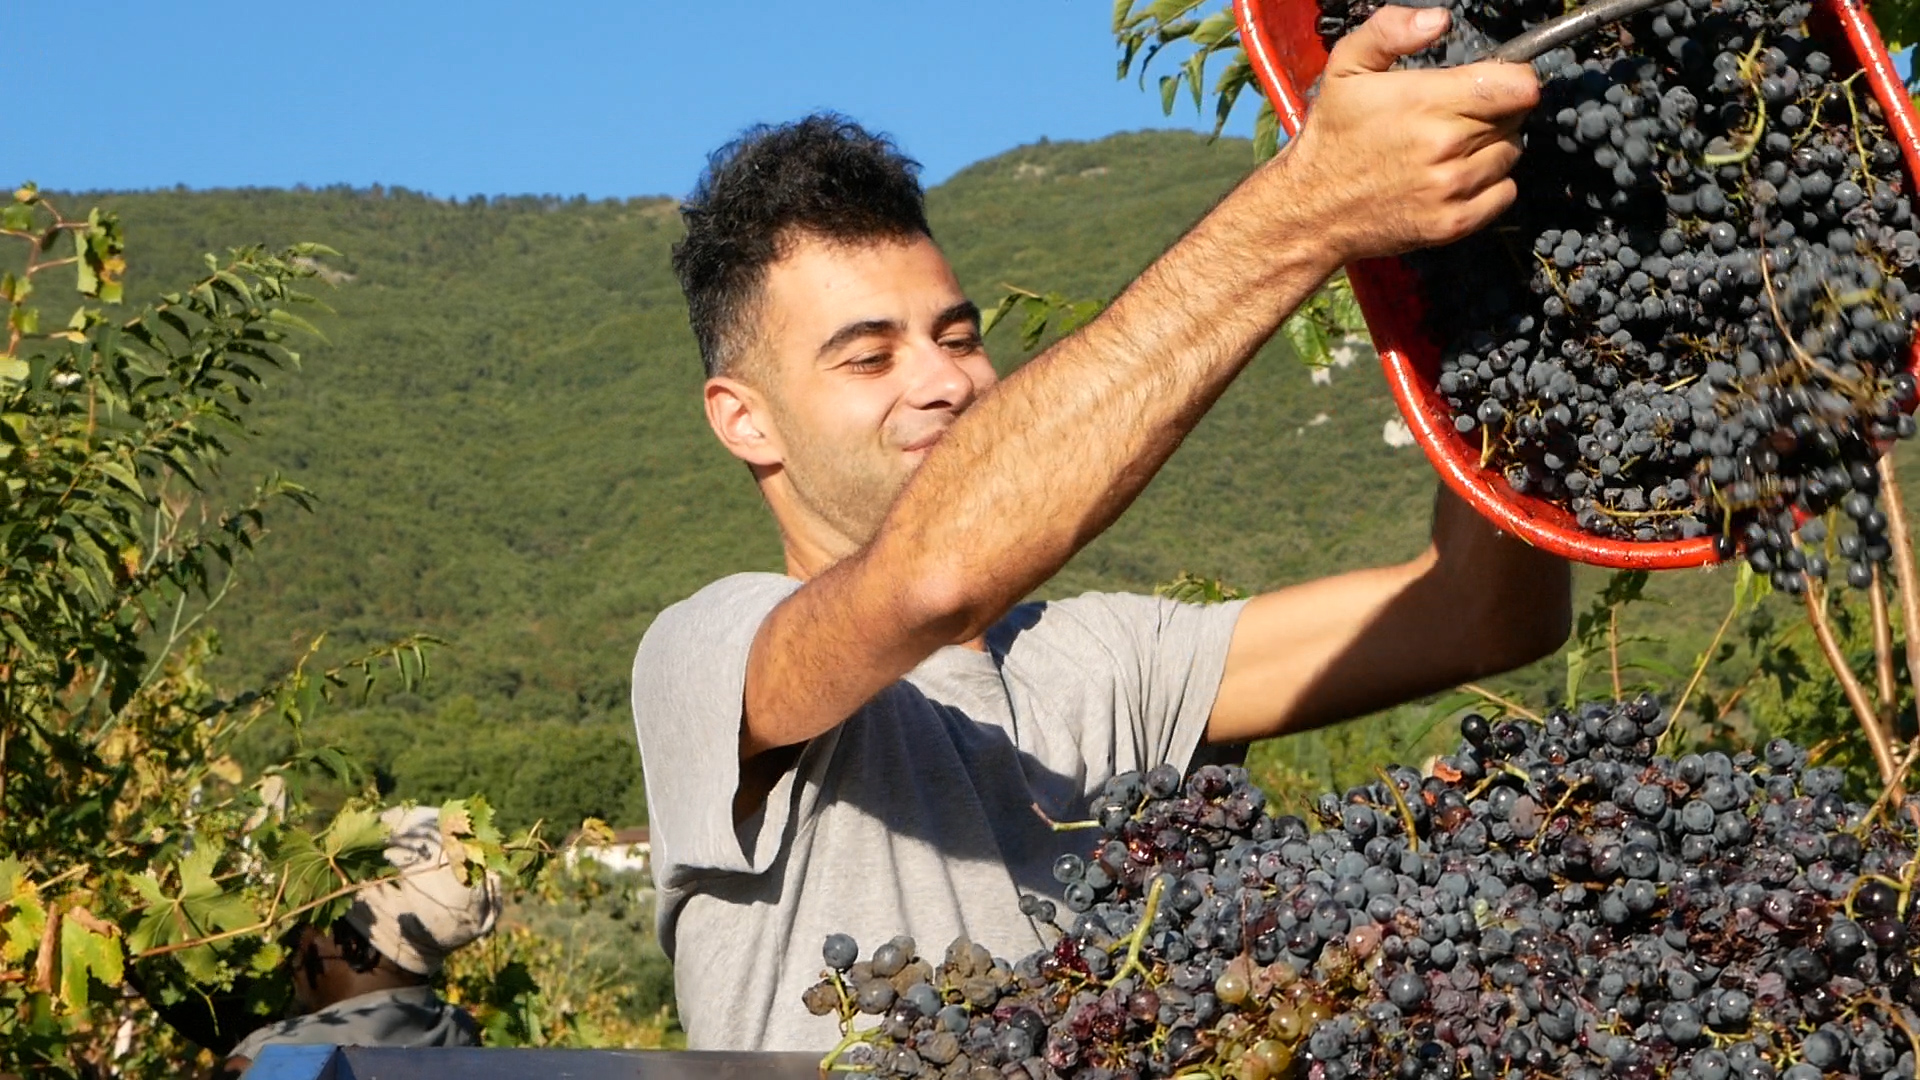 Esperienza sensoriale Assisi Tili Vini - Vendemmiamo insieme 5